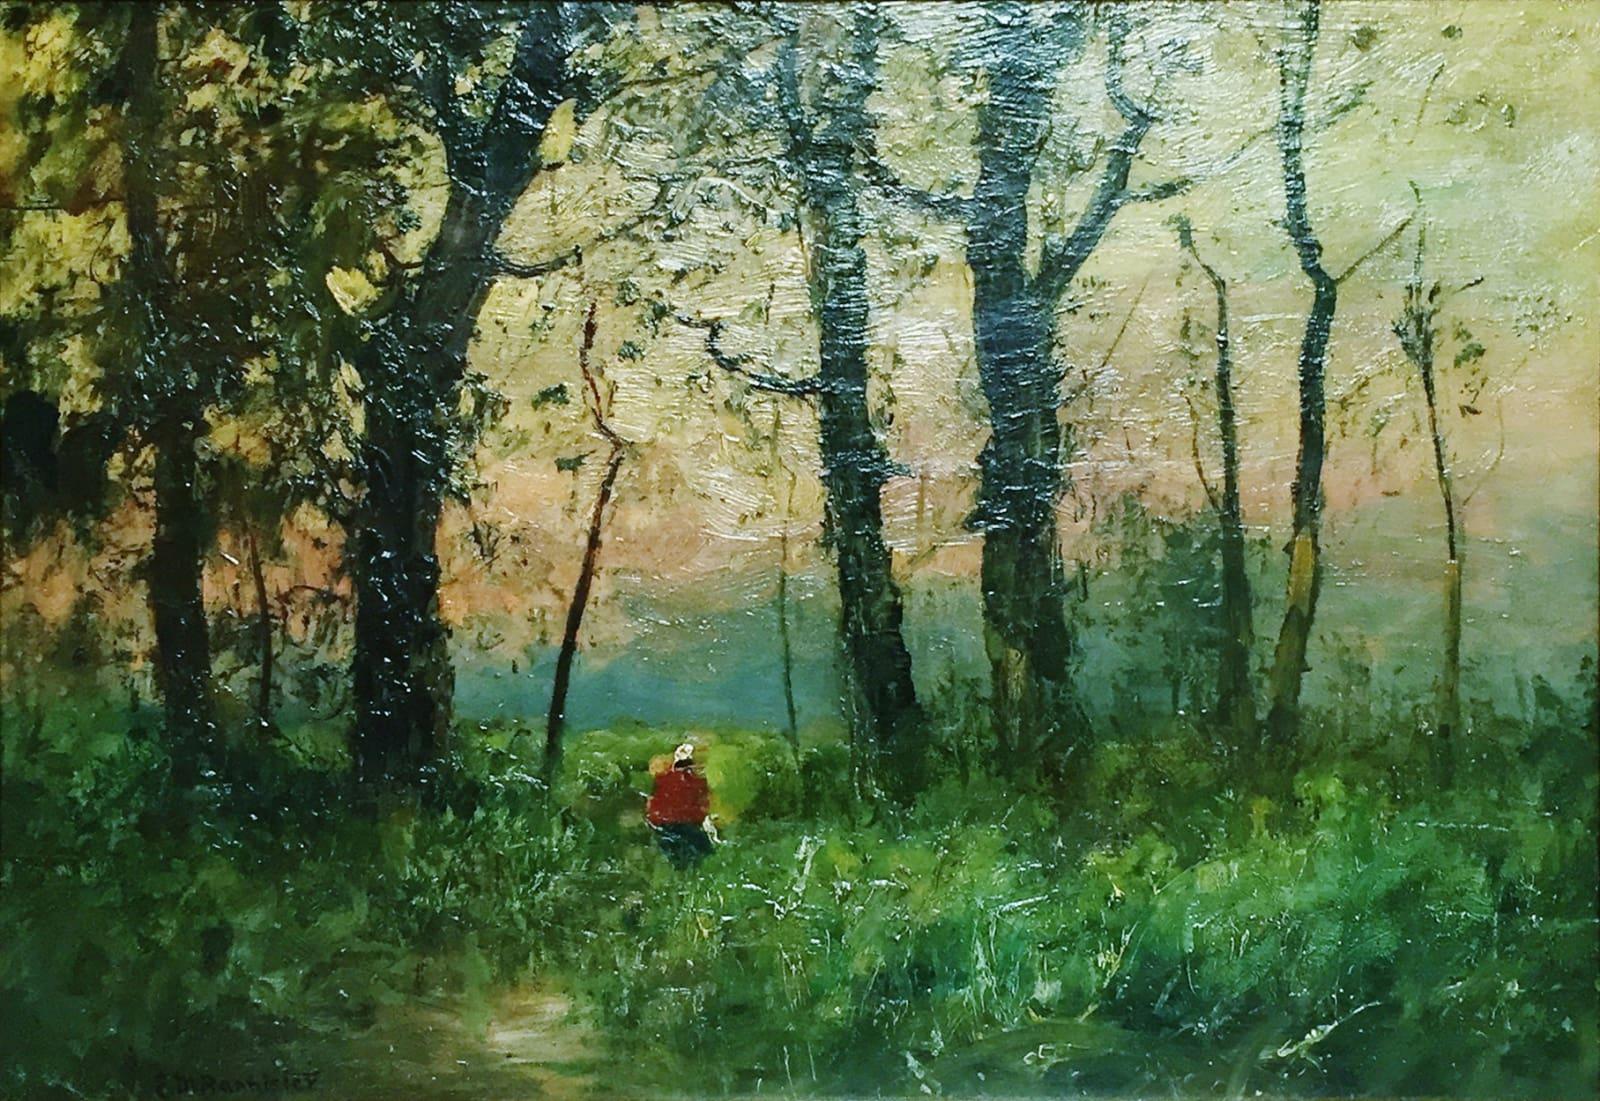 Edward Mitchell Bannister, Untitled (Landscape) Single Image Between Trees, c.1882